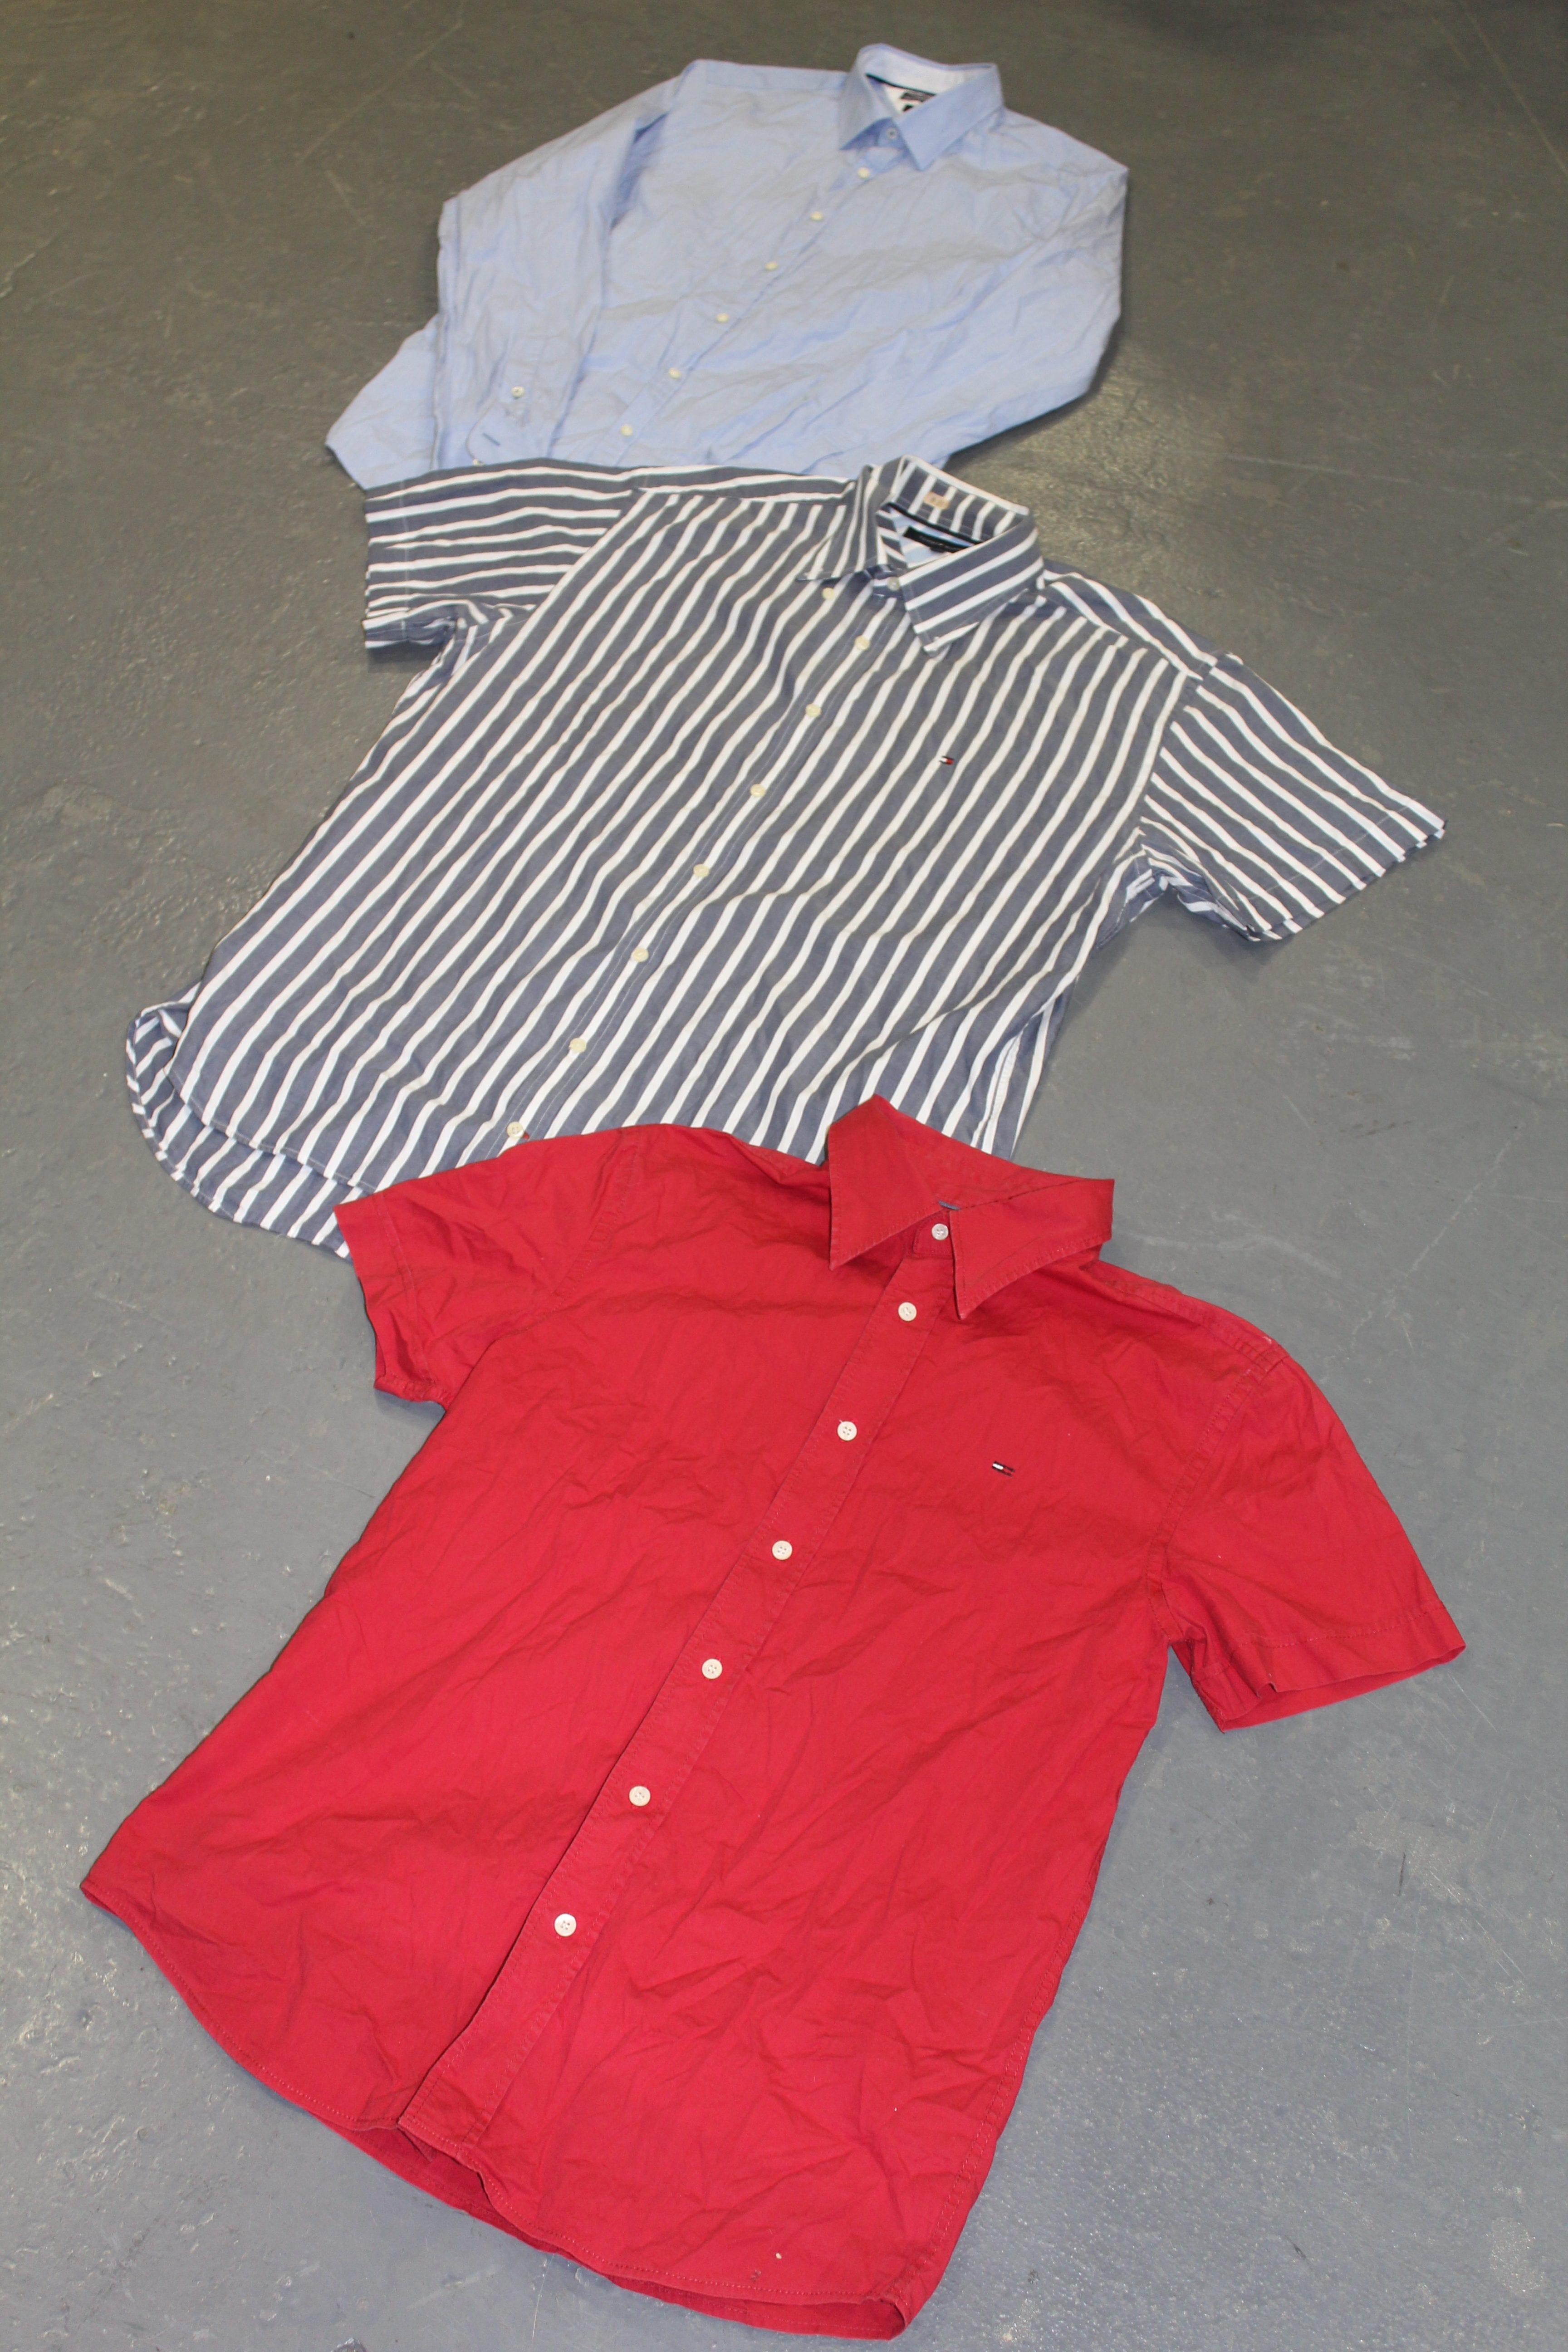 Vintage Tommy Hilfiger Shirts & Polo Mix